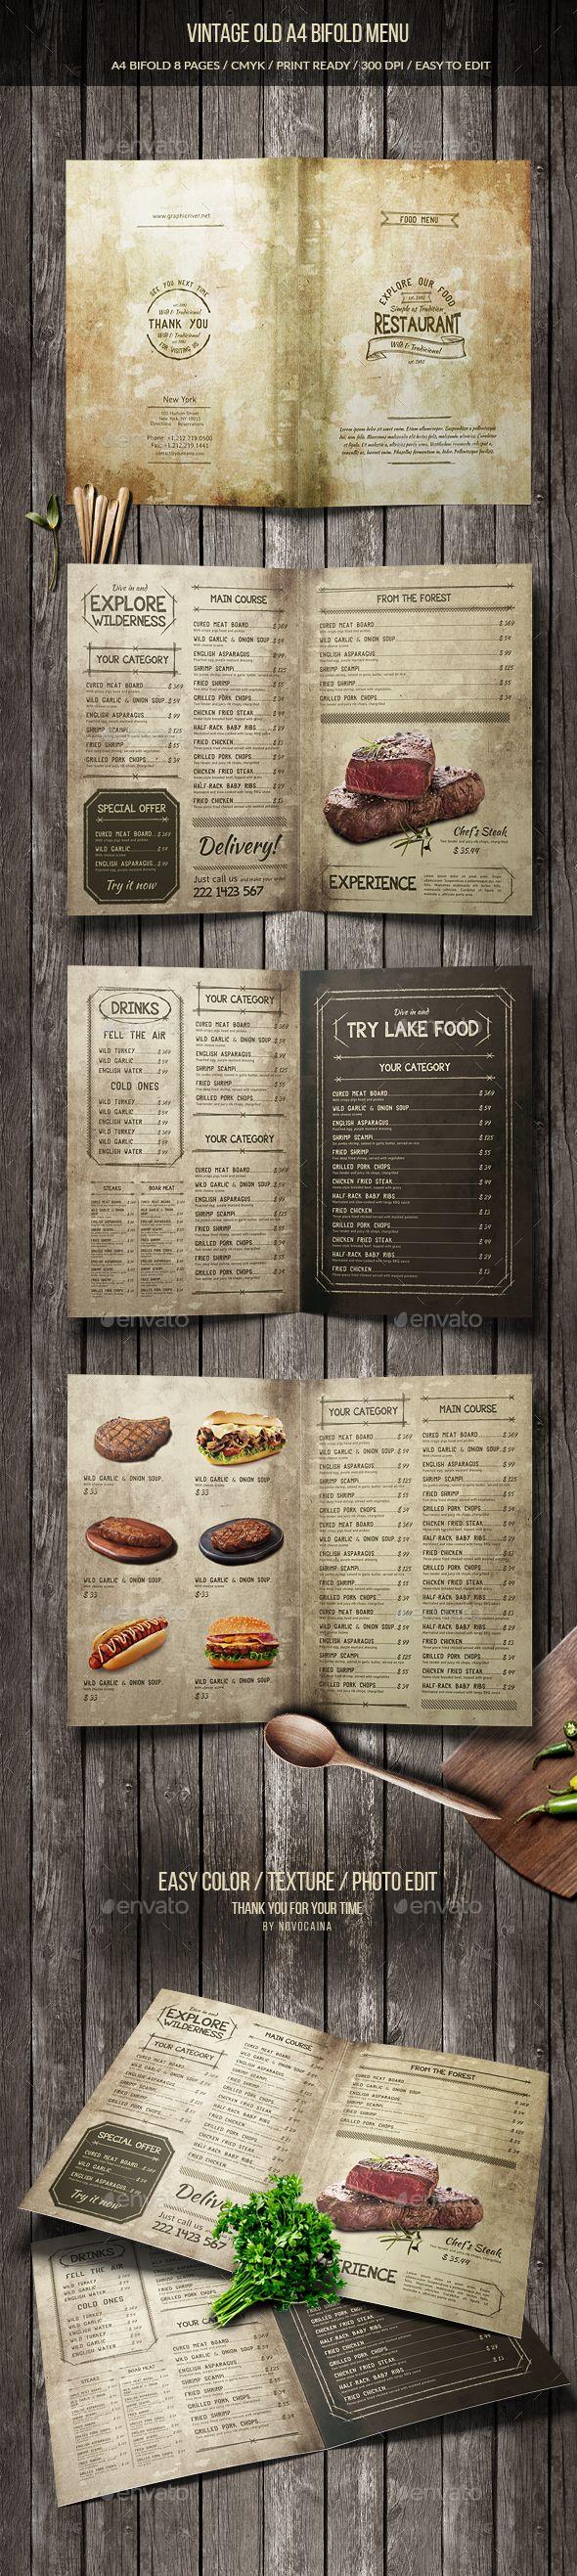 vintage old a4 bifold menu 8 pages メニューデザイン メニュー